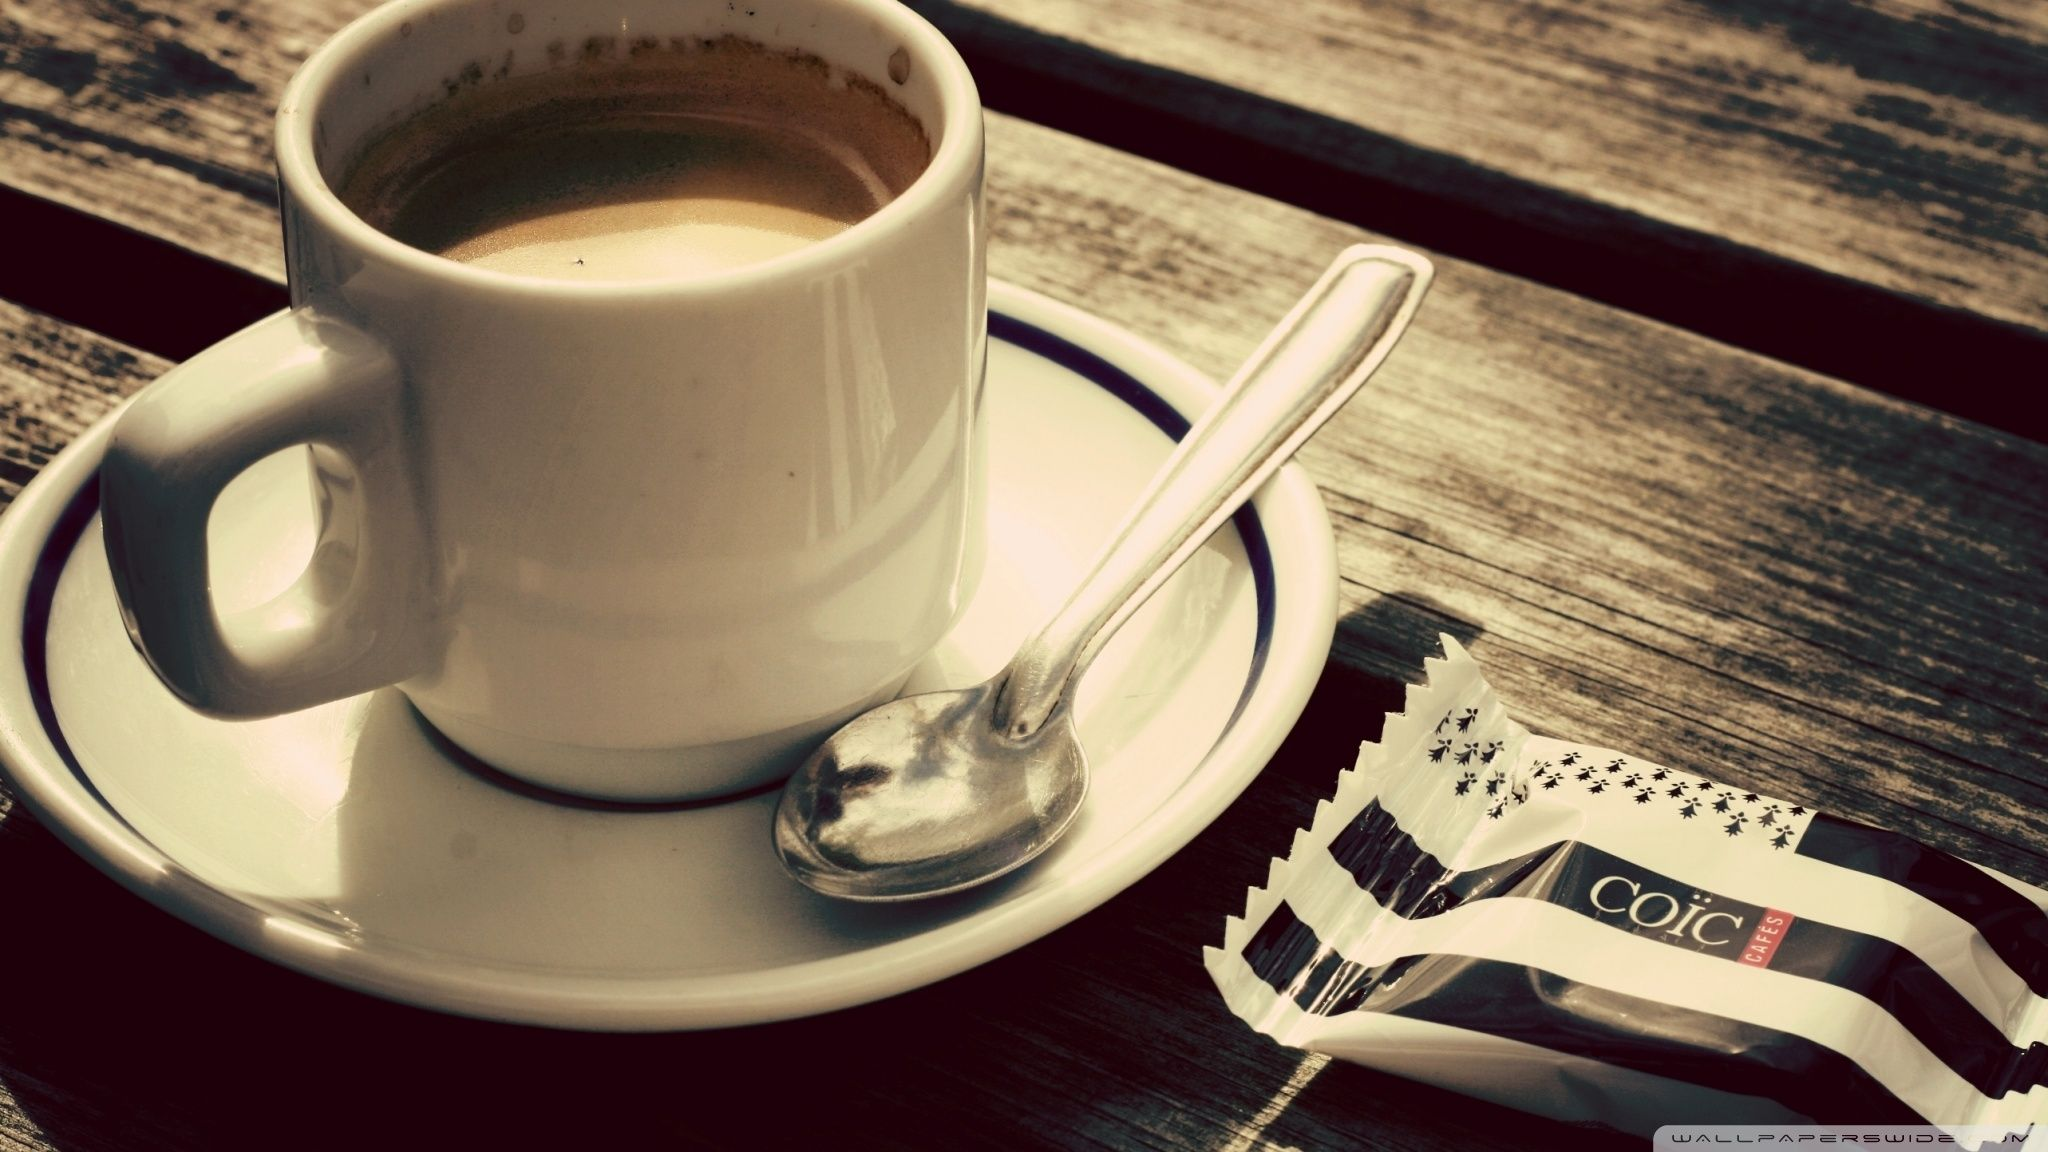 Biscuit And Coffee Cup HD desktop wallpaper High